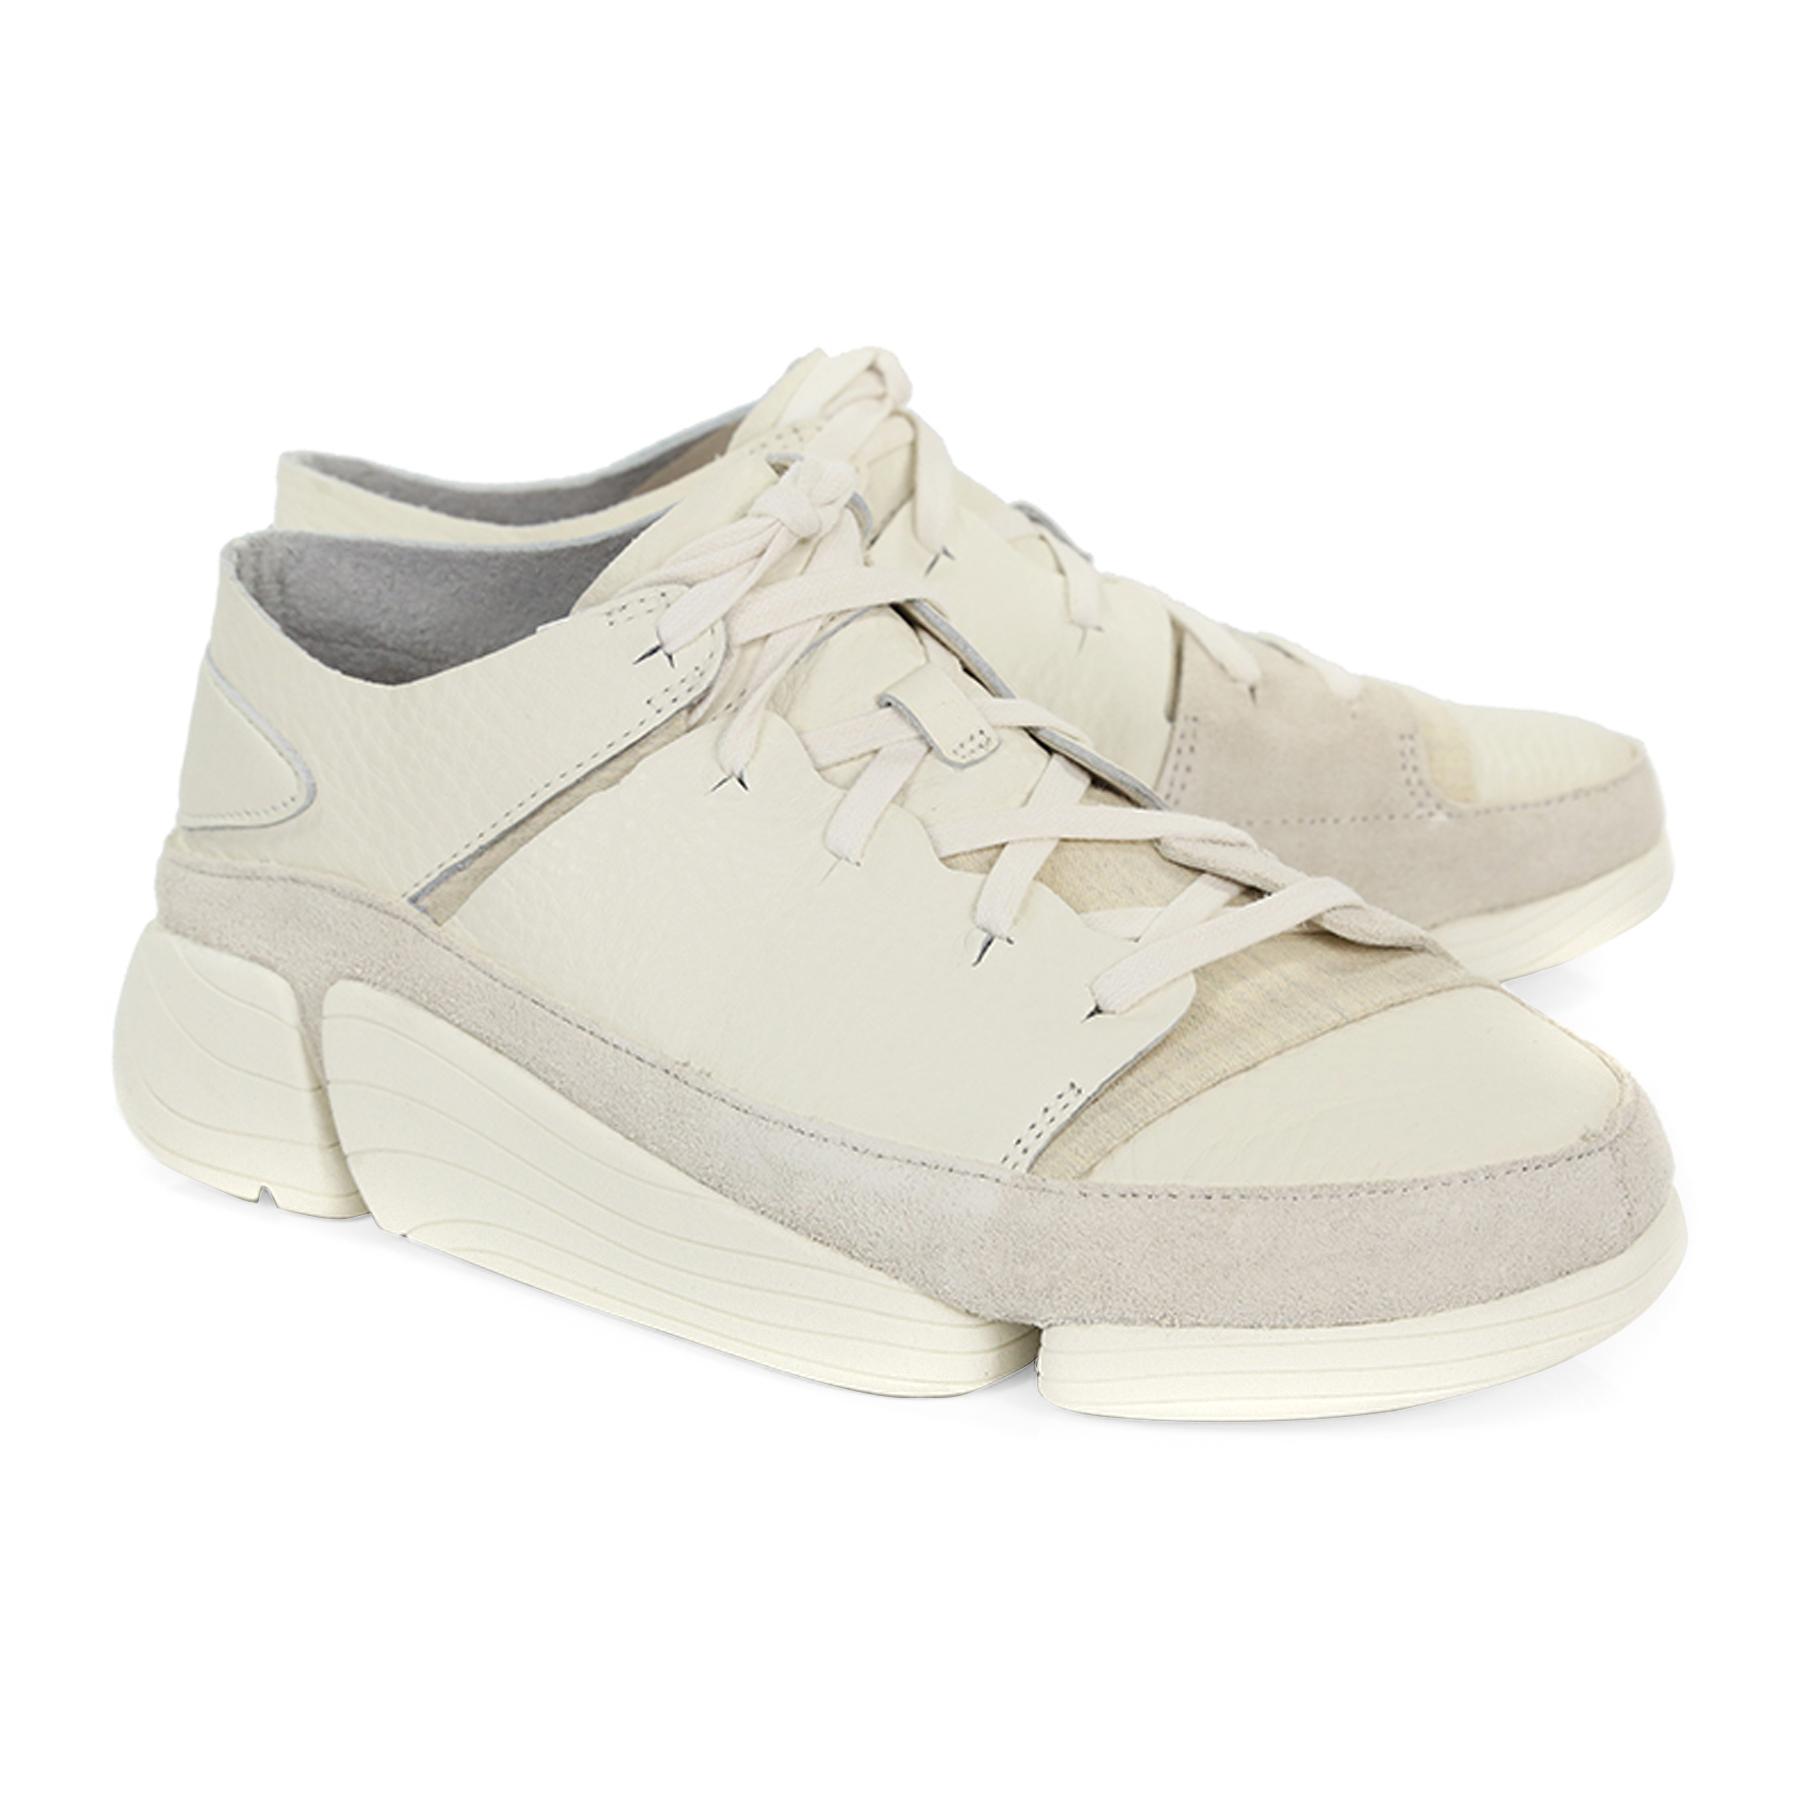 Clarks Originals Trigenic Evo Shoes White   Country Attire US